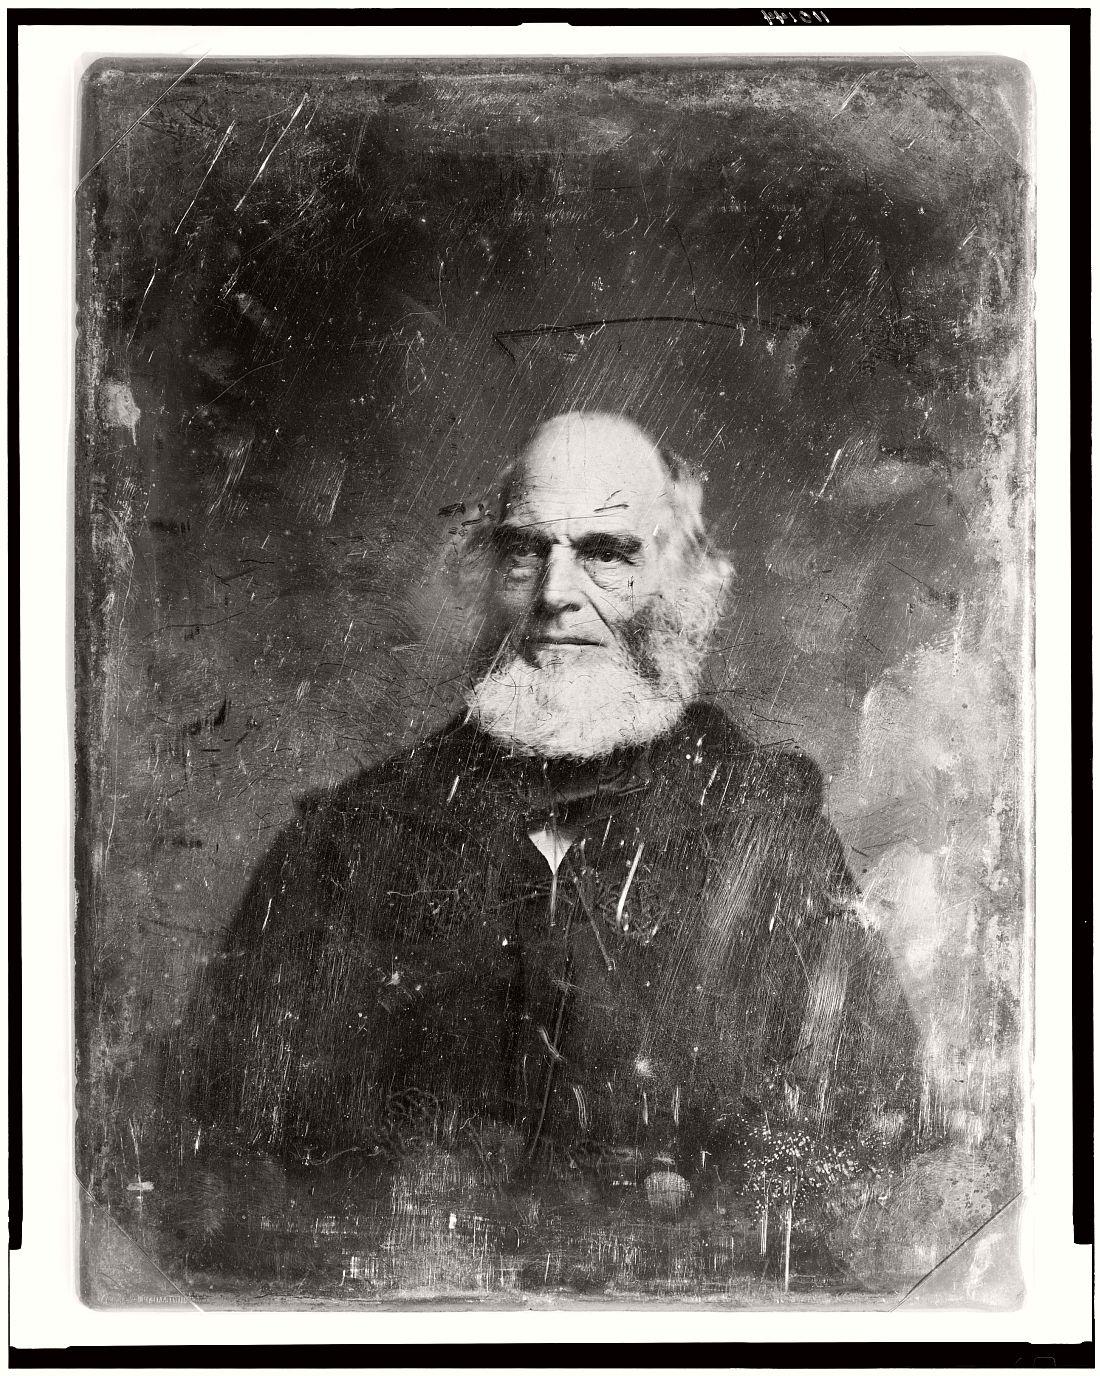 vintage-daguerreotype-portraits-from-xix-century-1844-1860-59